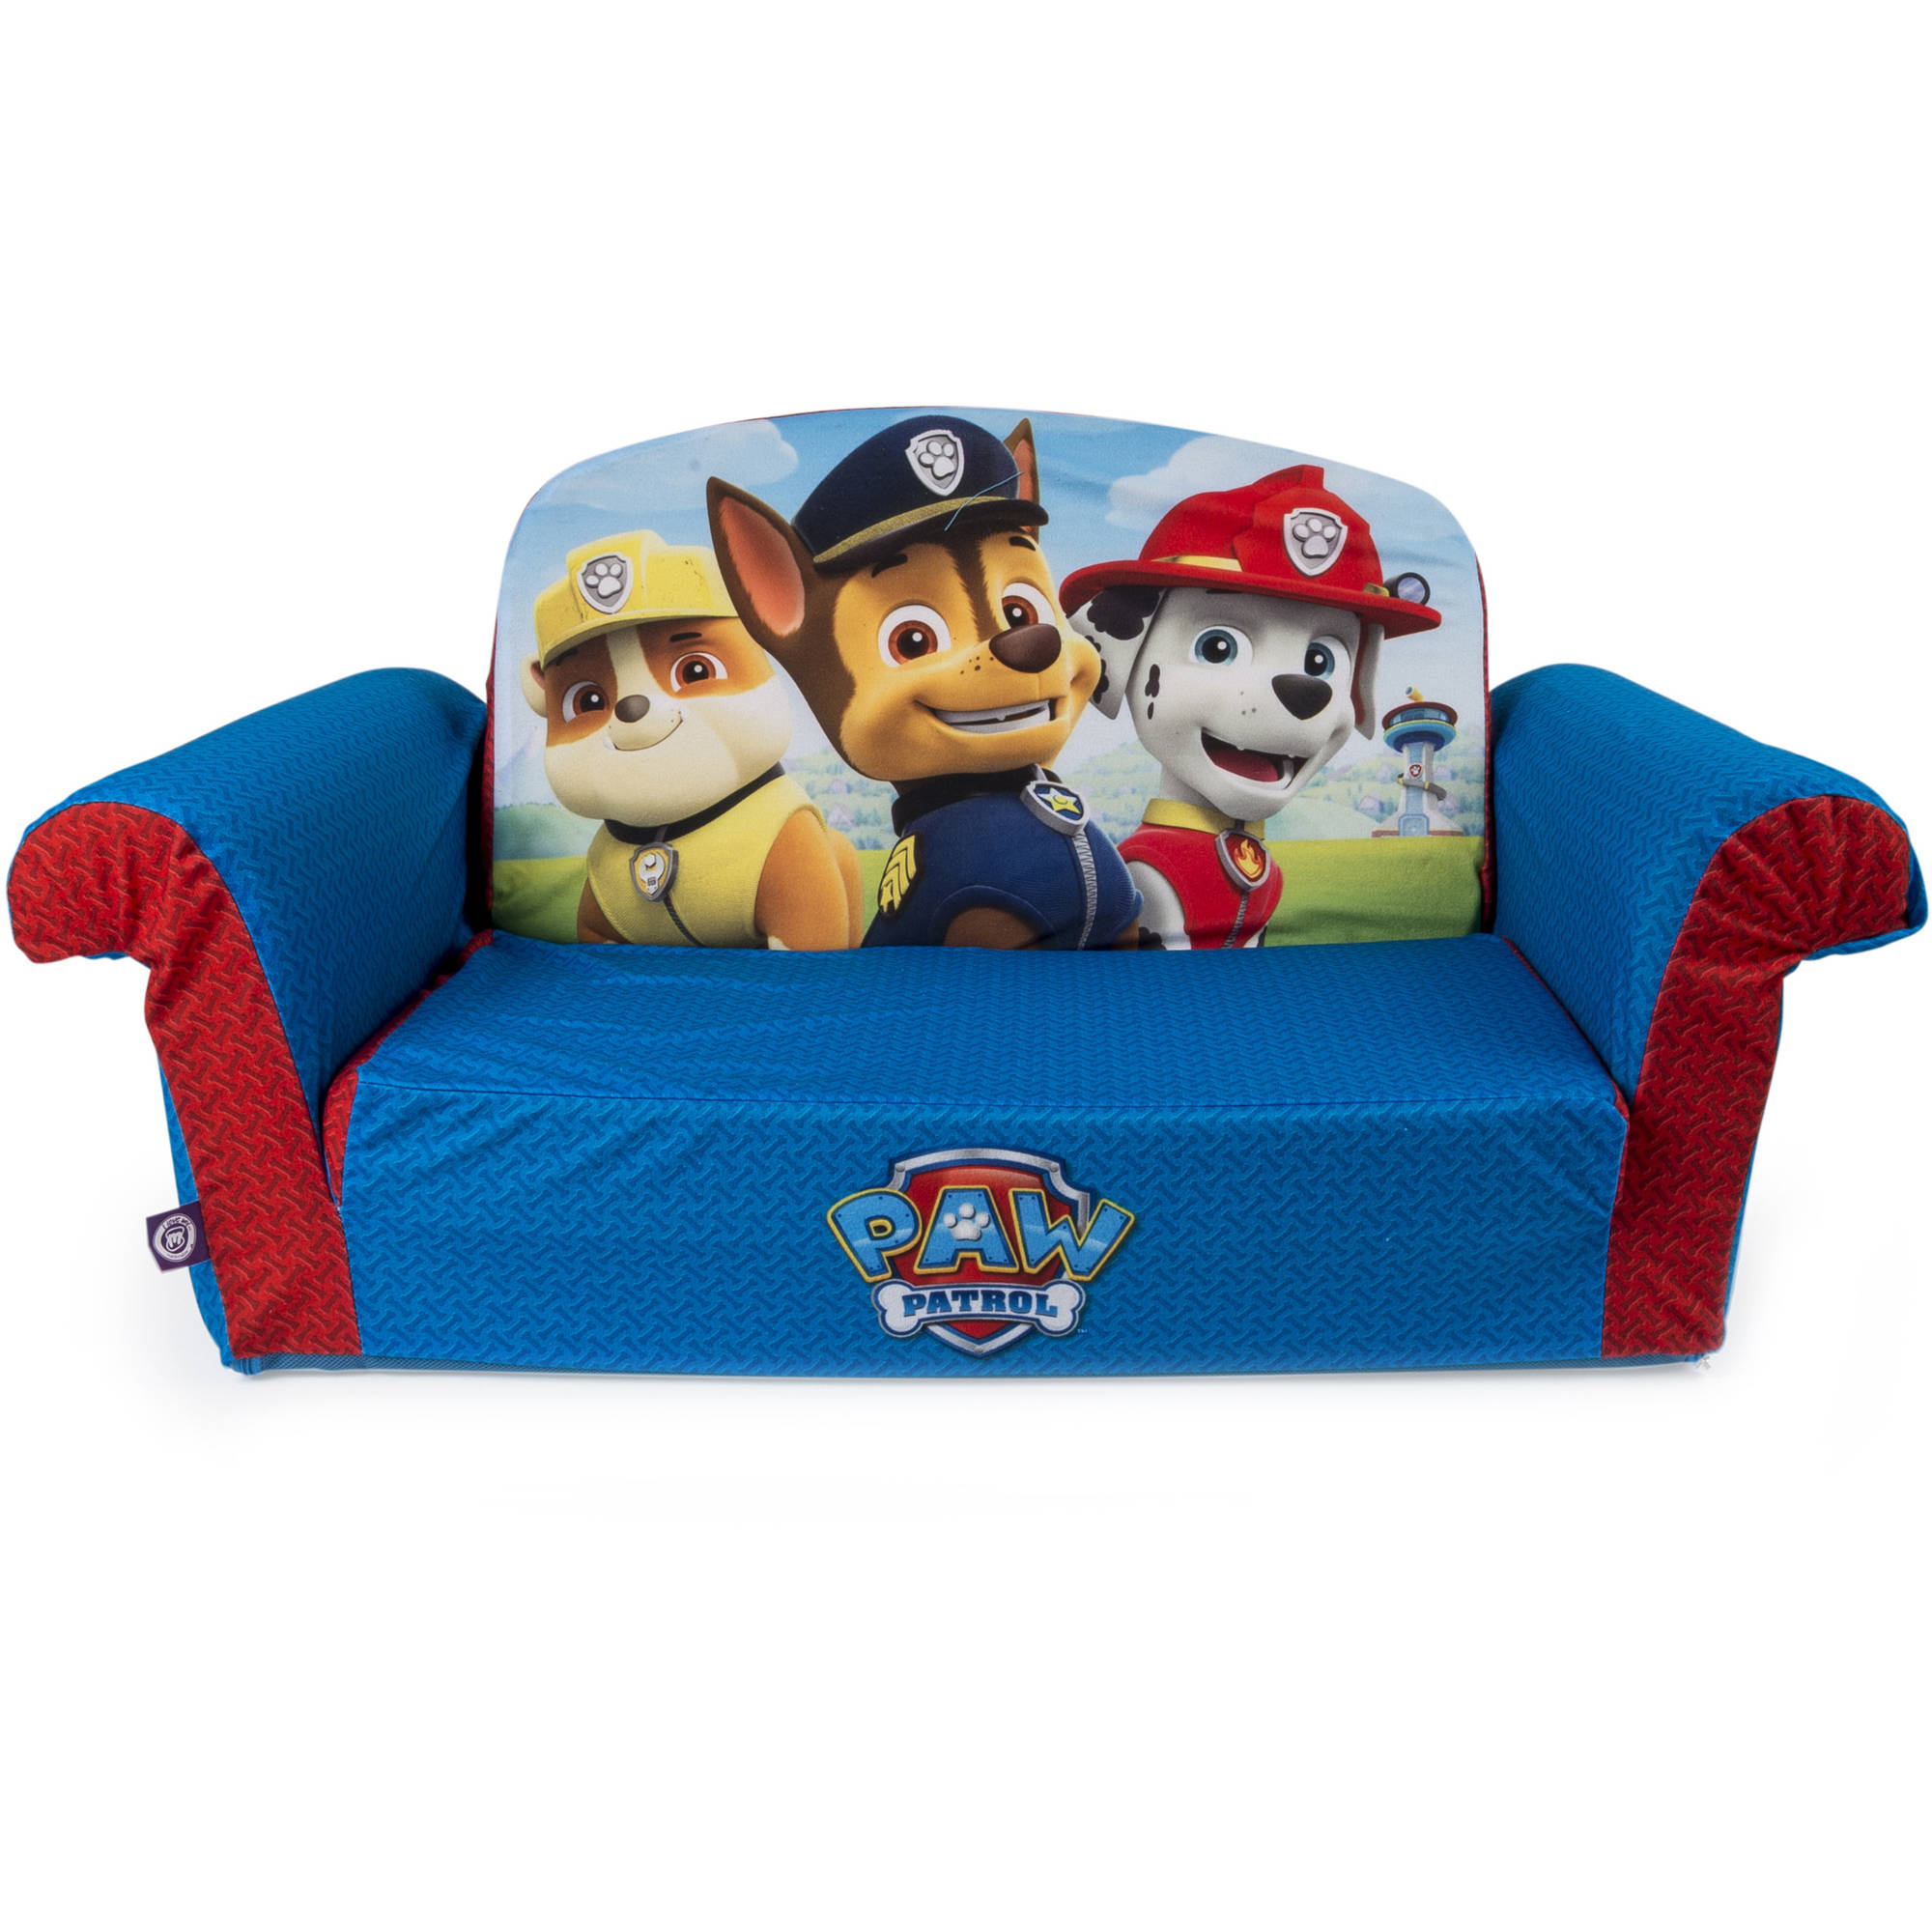 Marshmallow Furniture 2-in-1 Paw Patrol Flip Open Sofa